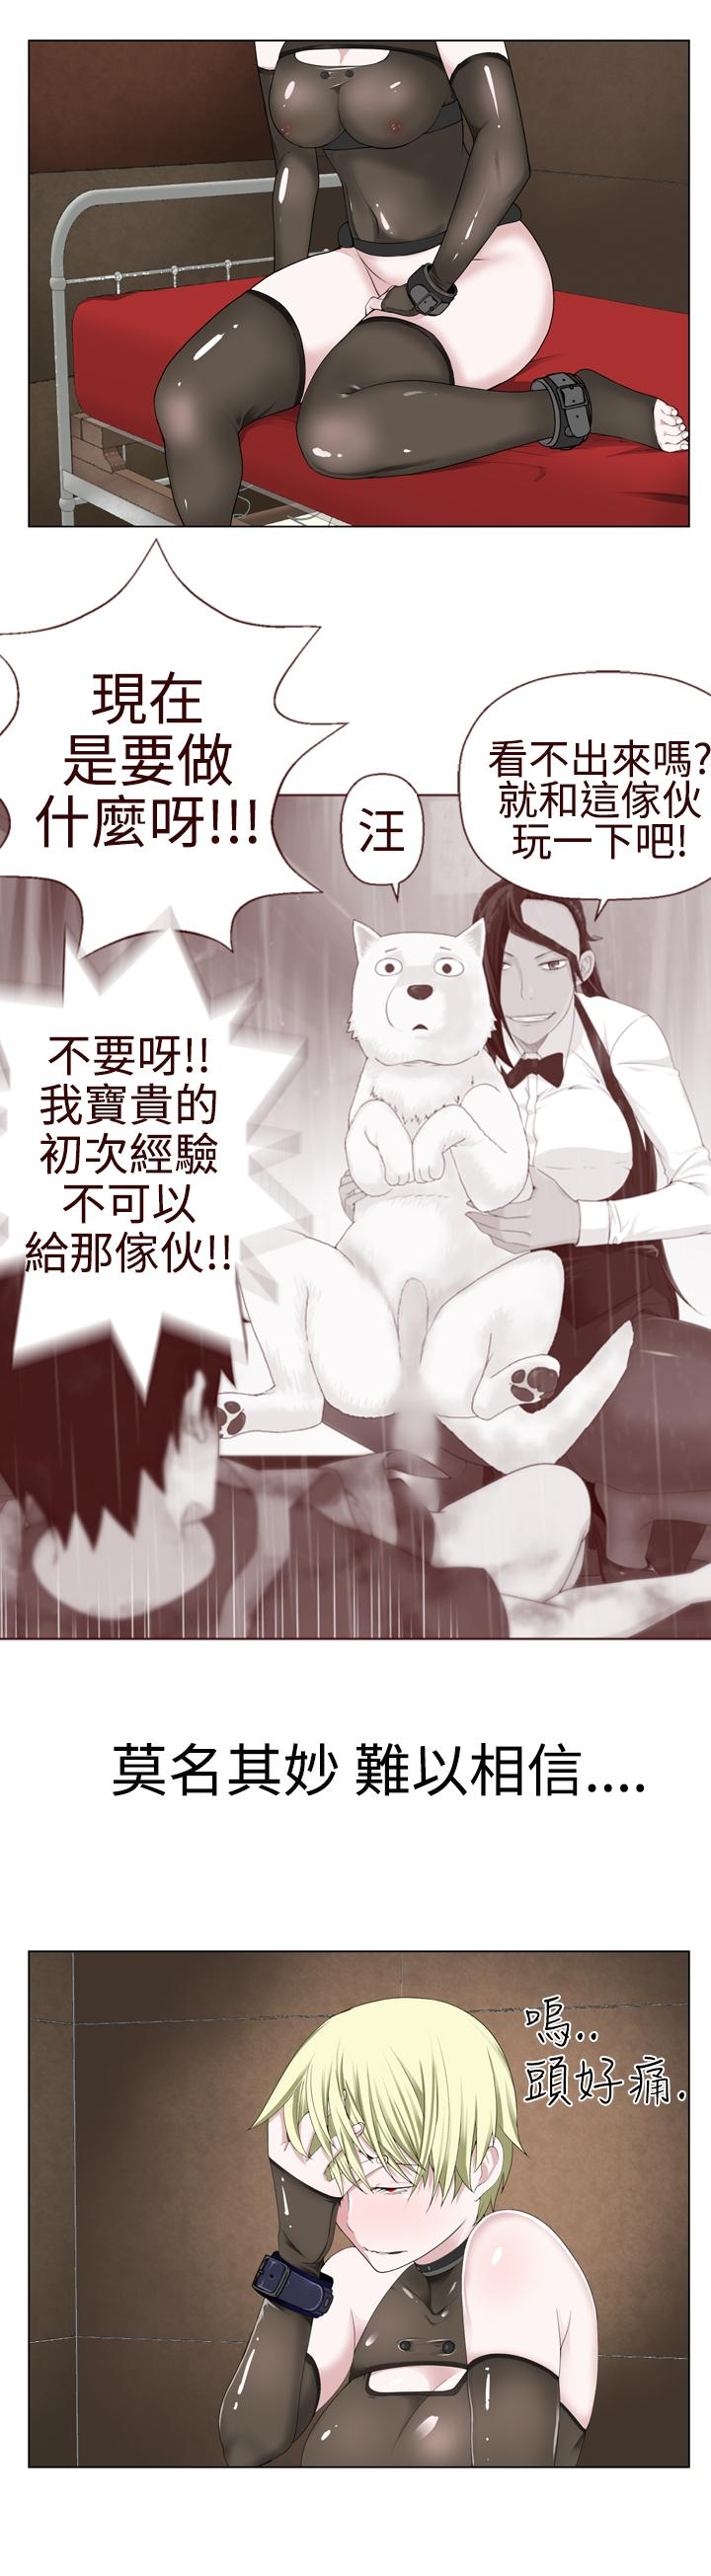 [SOSO] Franken Jo 为爱而生 法兰克赵 Ch.1~19 [Chinese]中文 299